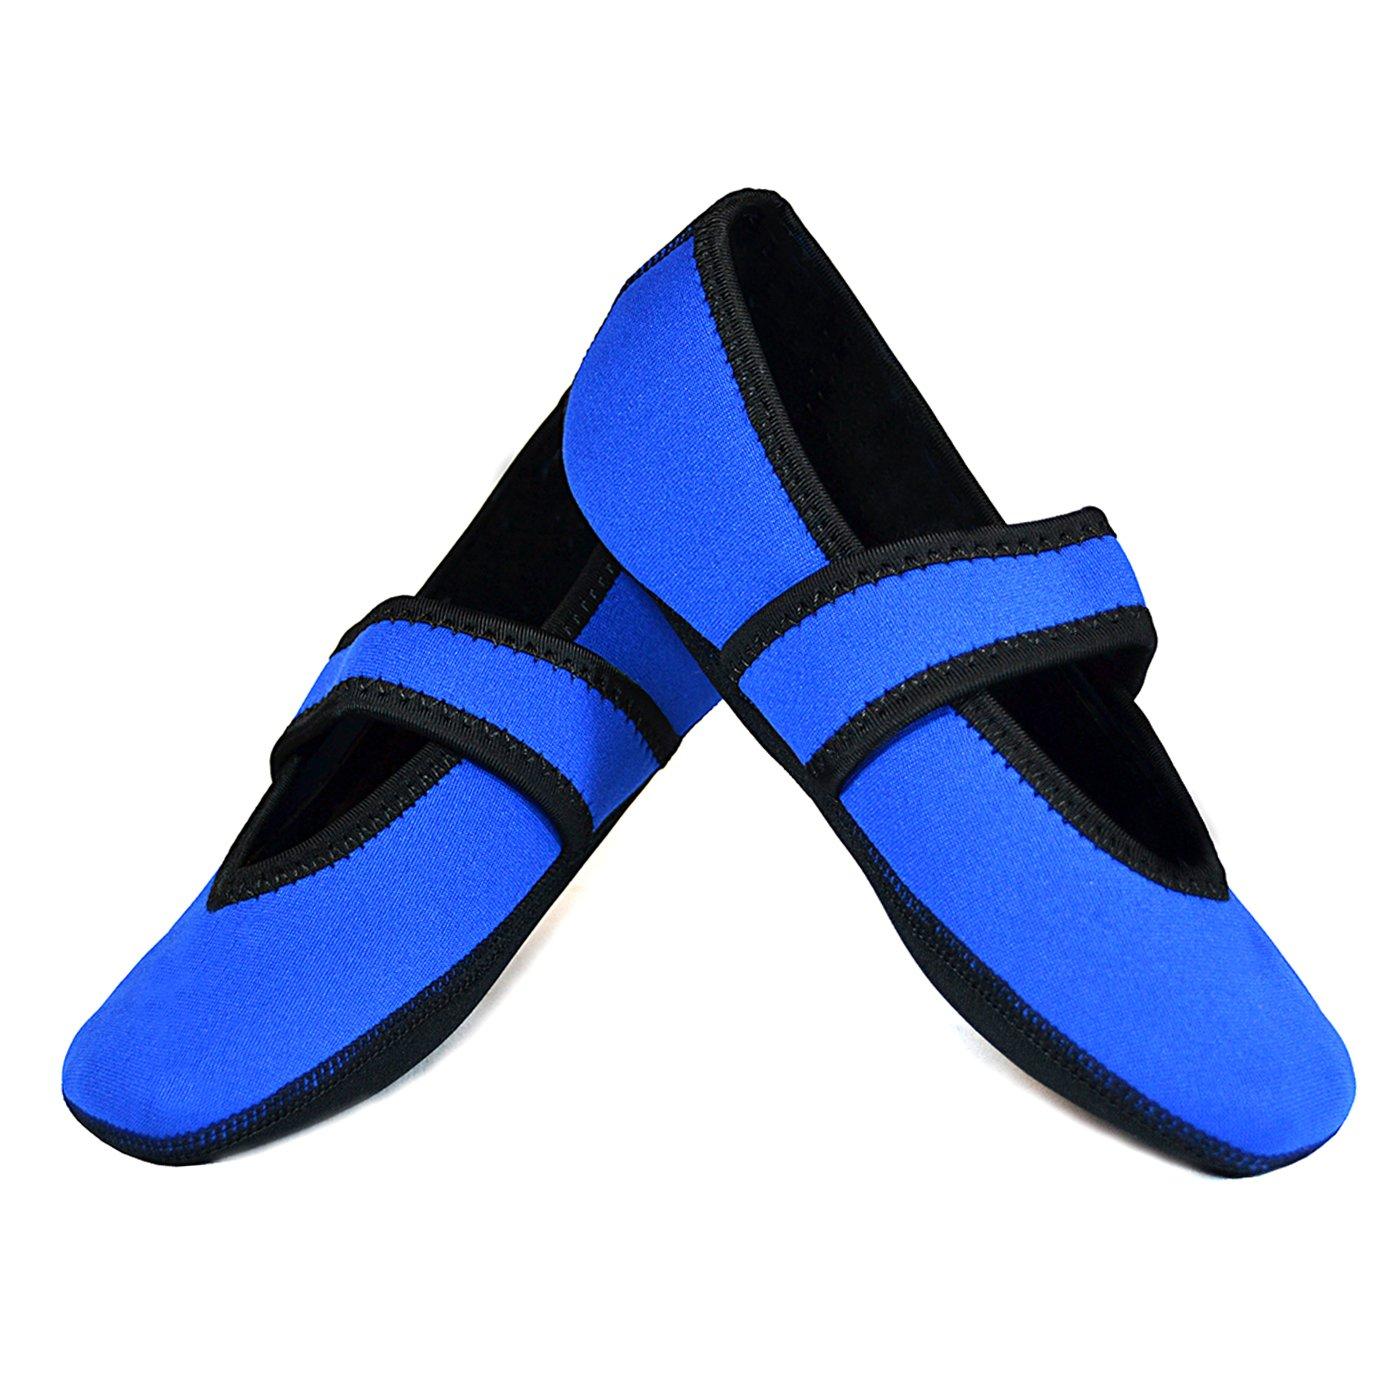 Nufoot Betsy Lou Women's Shoes, Best Foldable & Flexible Flats, Slipper Socks, Travel Slippers & Exercise Shoes, Dance Shoes, Yoga Socks, House Shoes, Indoor Slippers, Royal Blue, X-Large